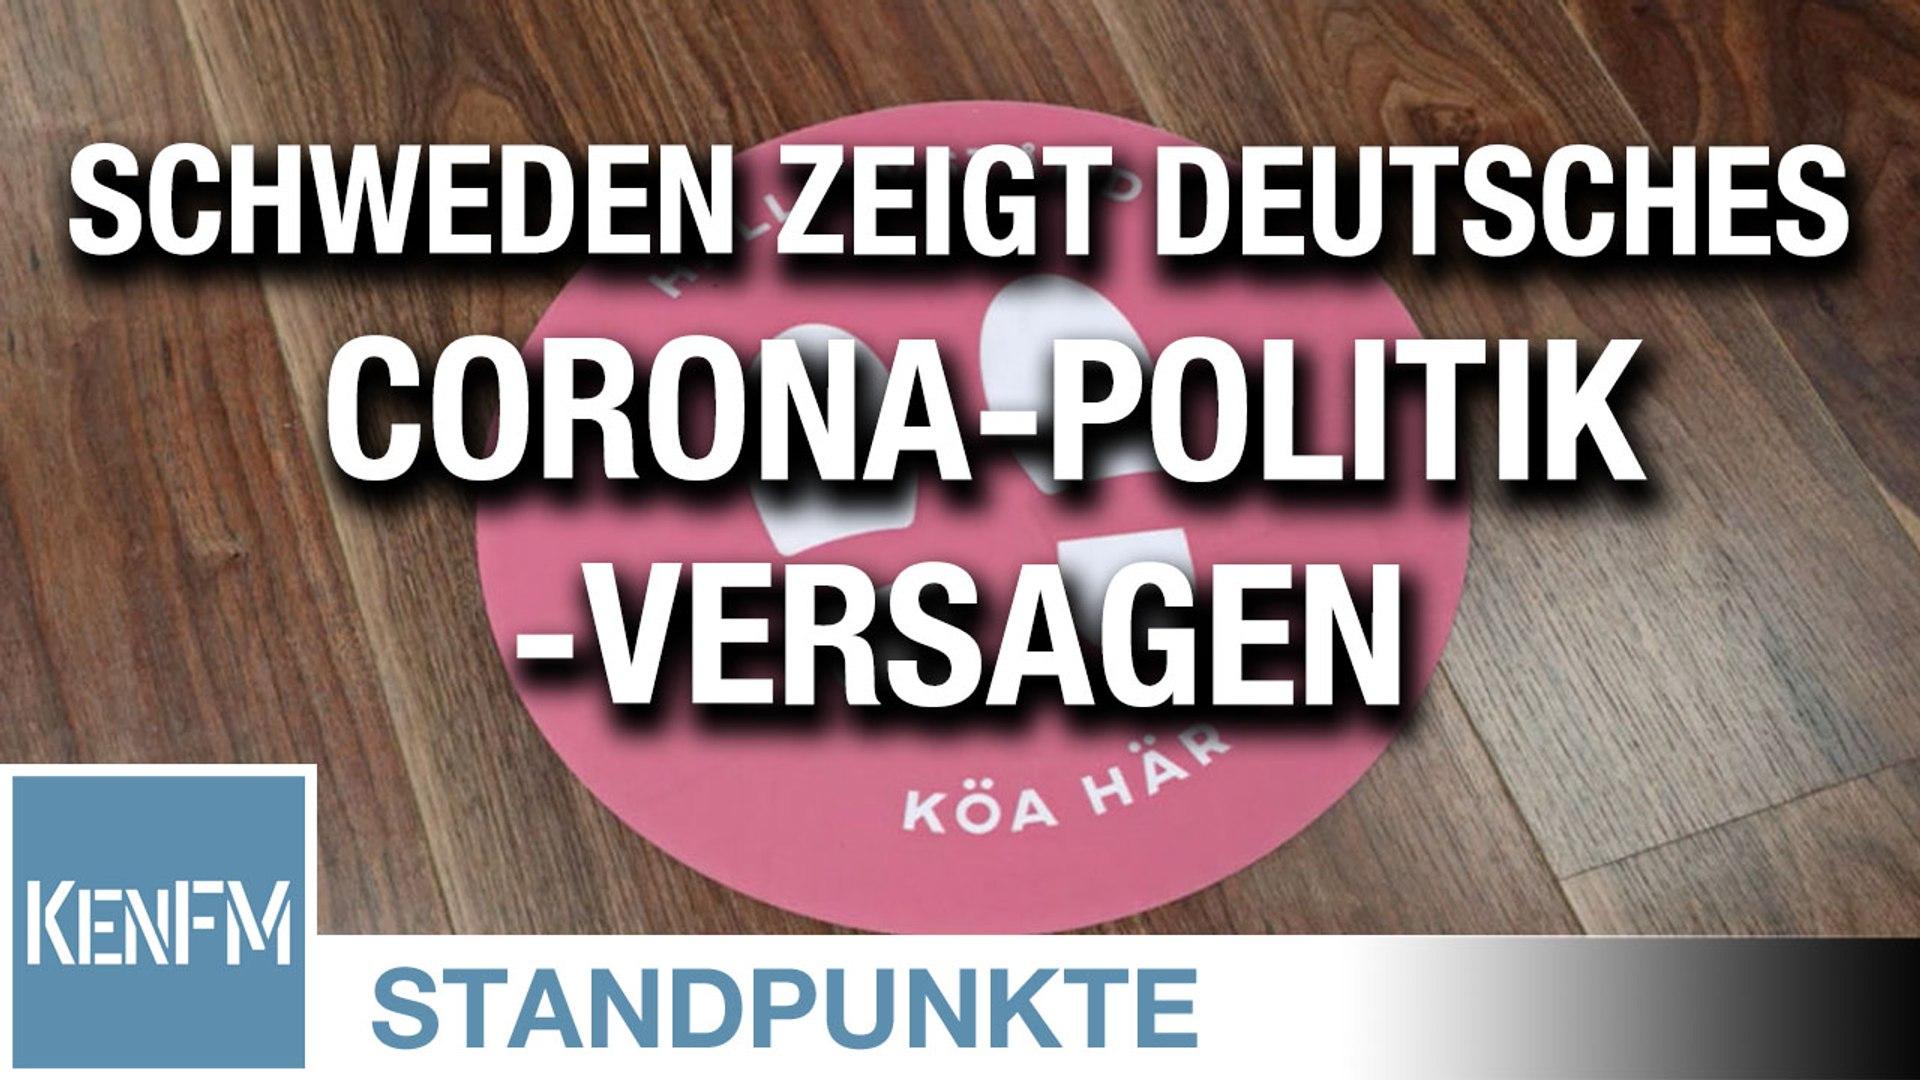 Schweden zeigt deutsches Corona-Politik-Versagen